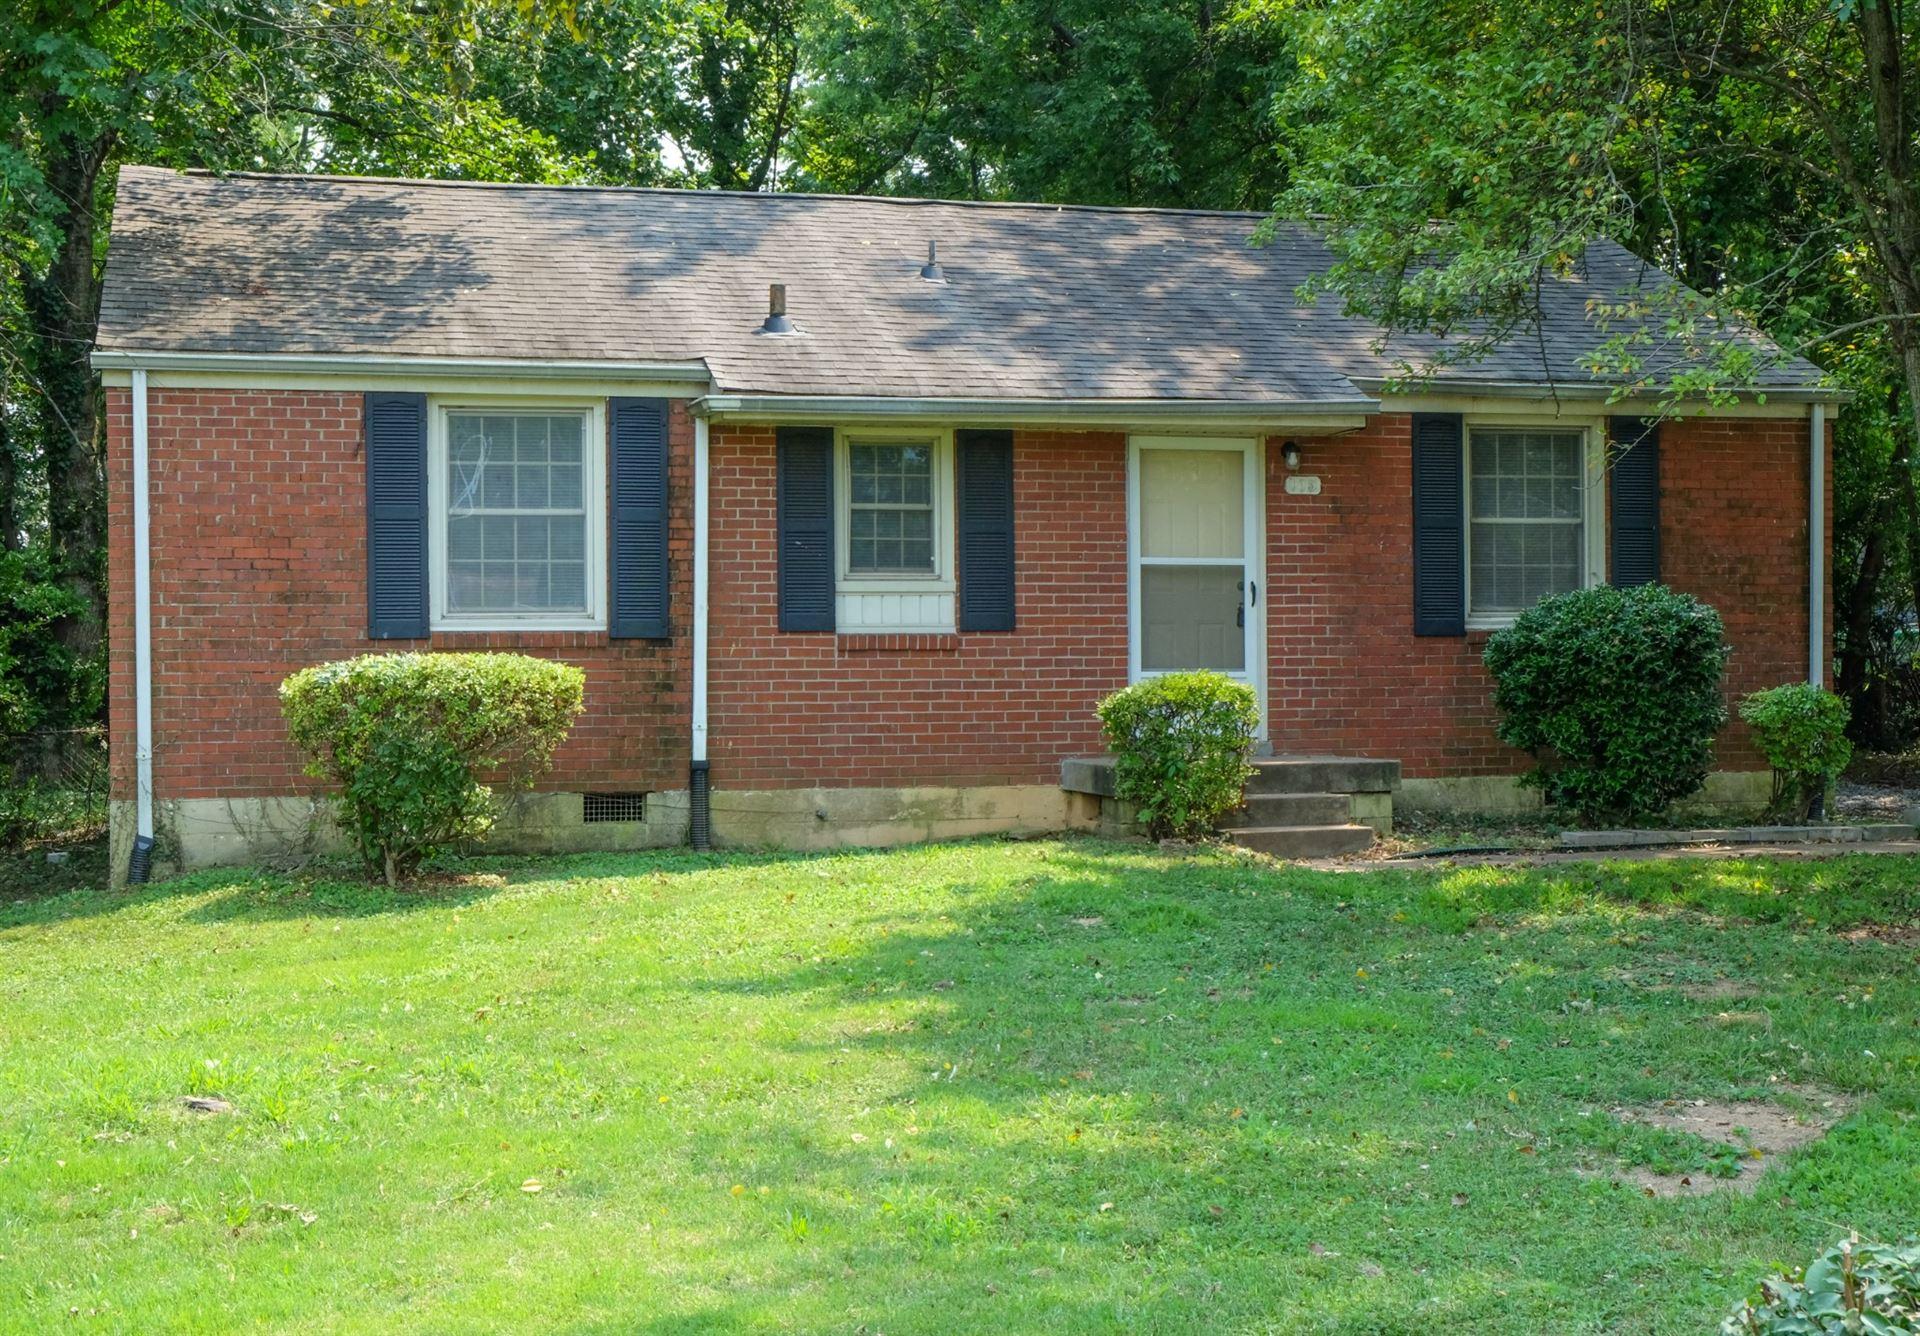 105 Garwood Dr, Nashville, TN 37210 - MLS#: 2277413